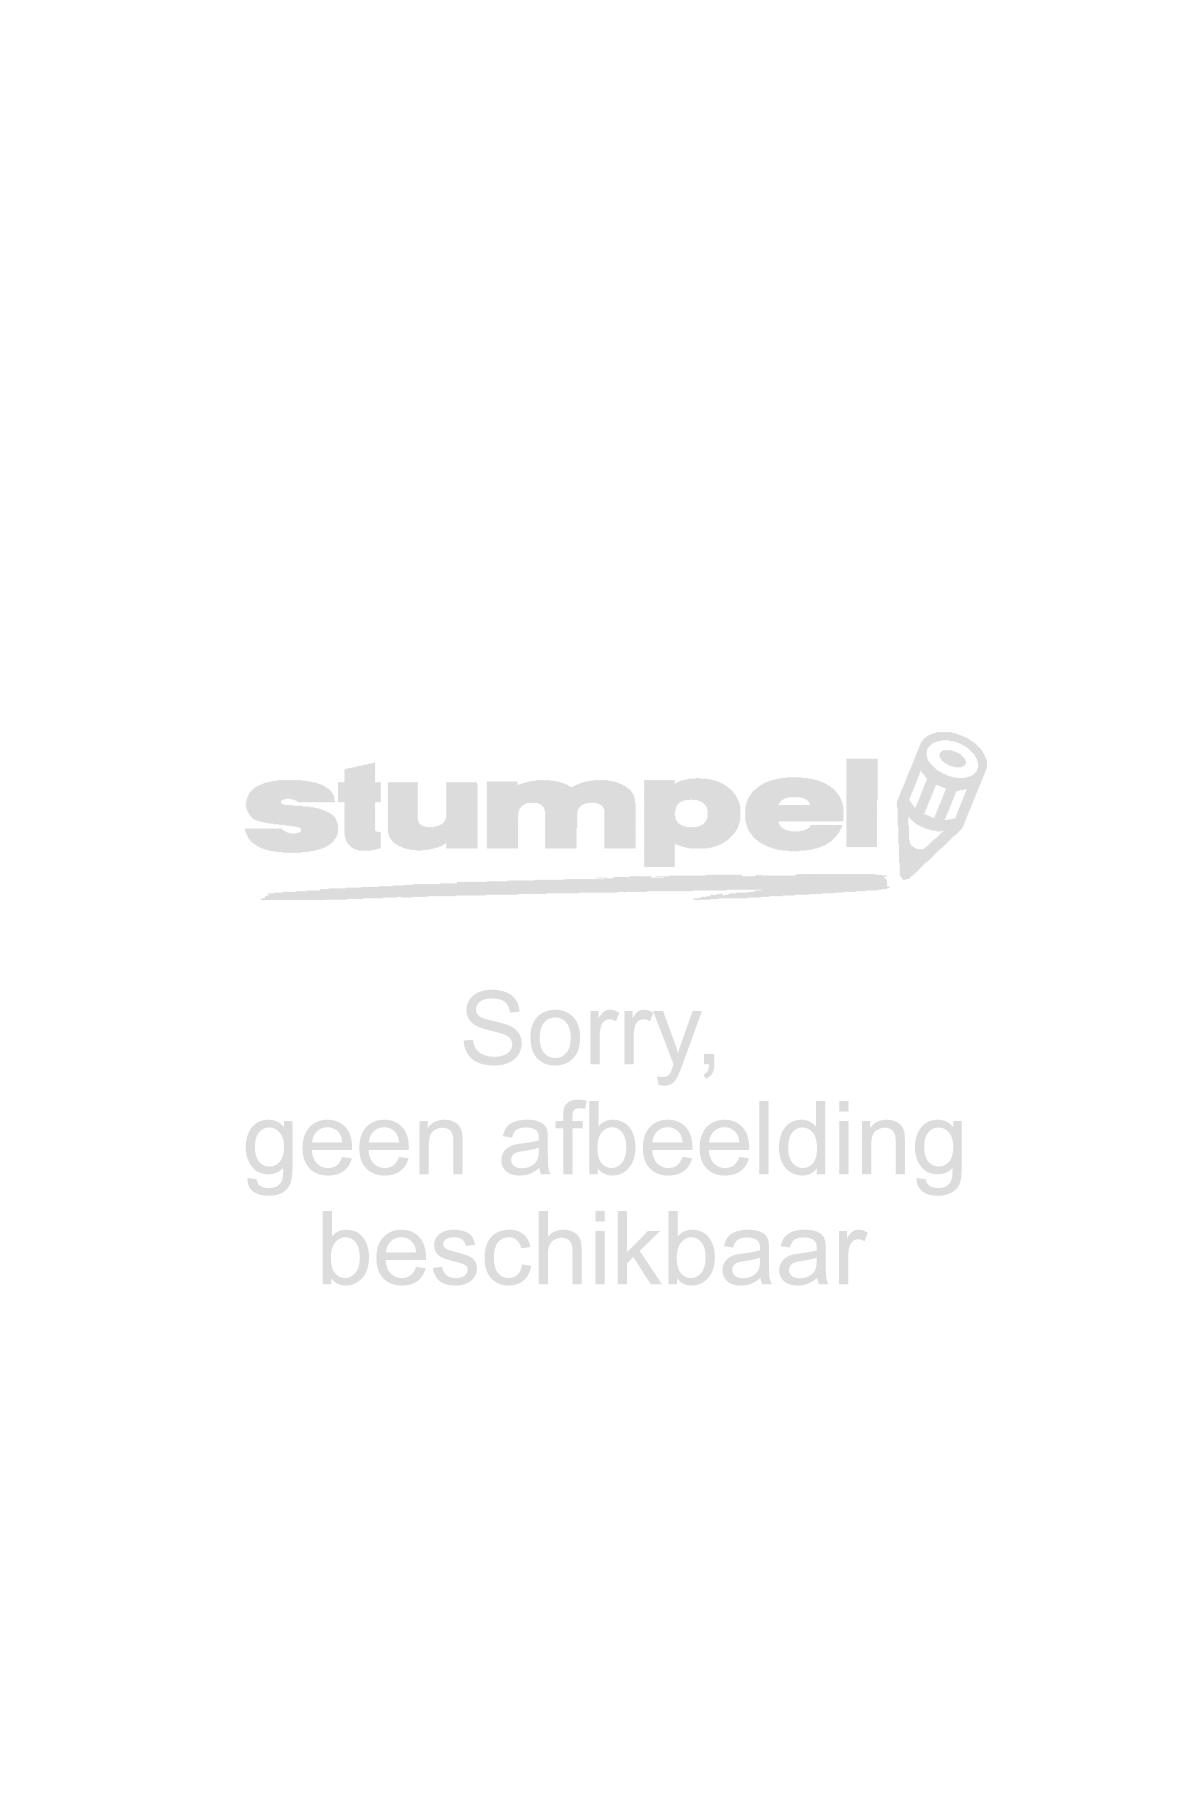 paraplu-minimax-opvouwbaar-blauw-impliva-10806576